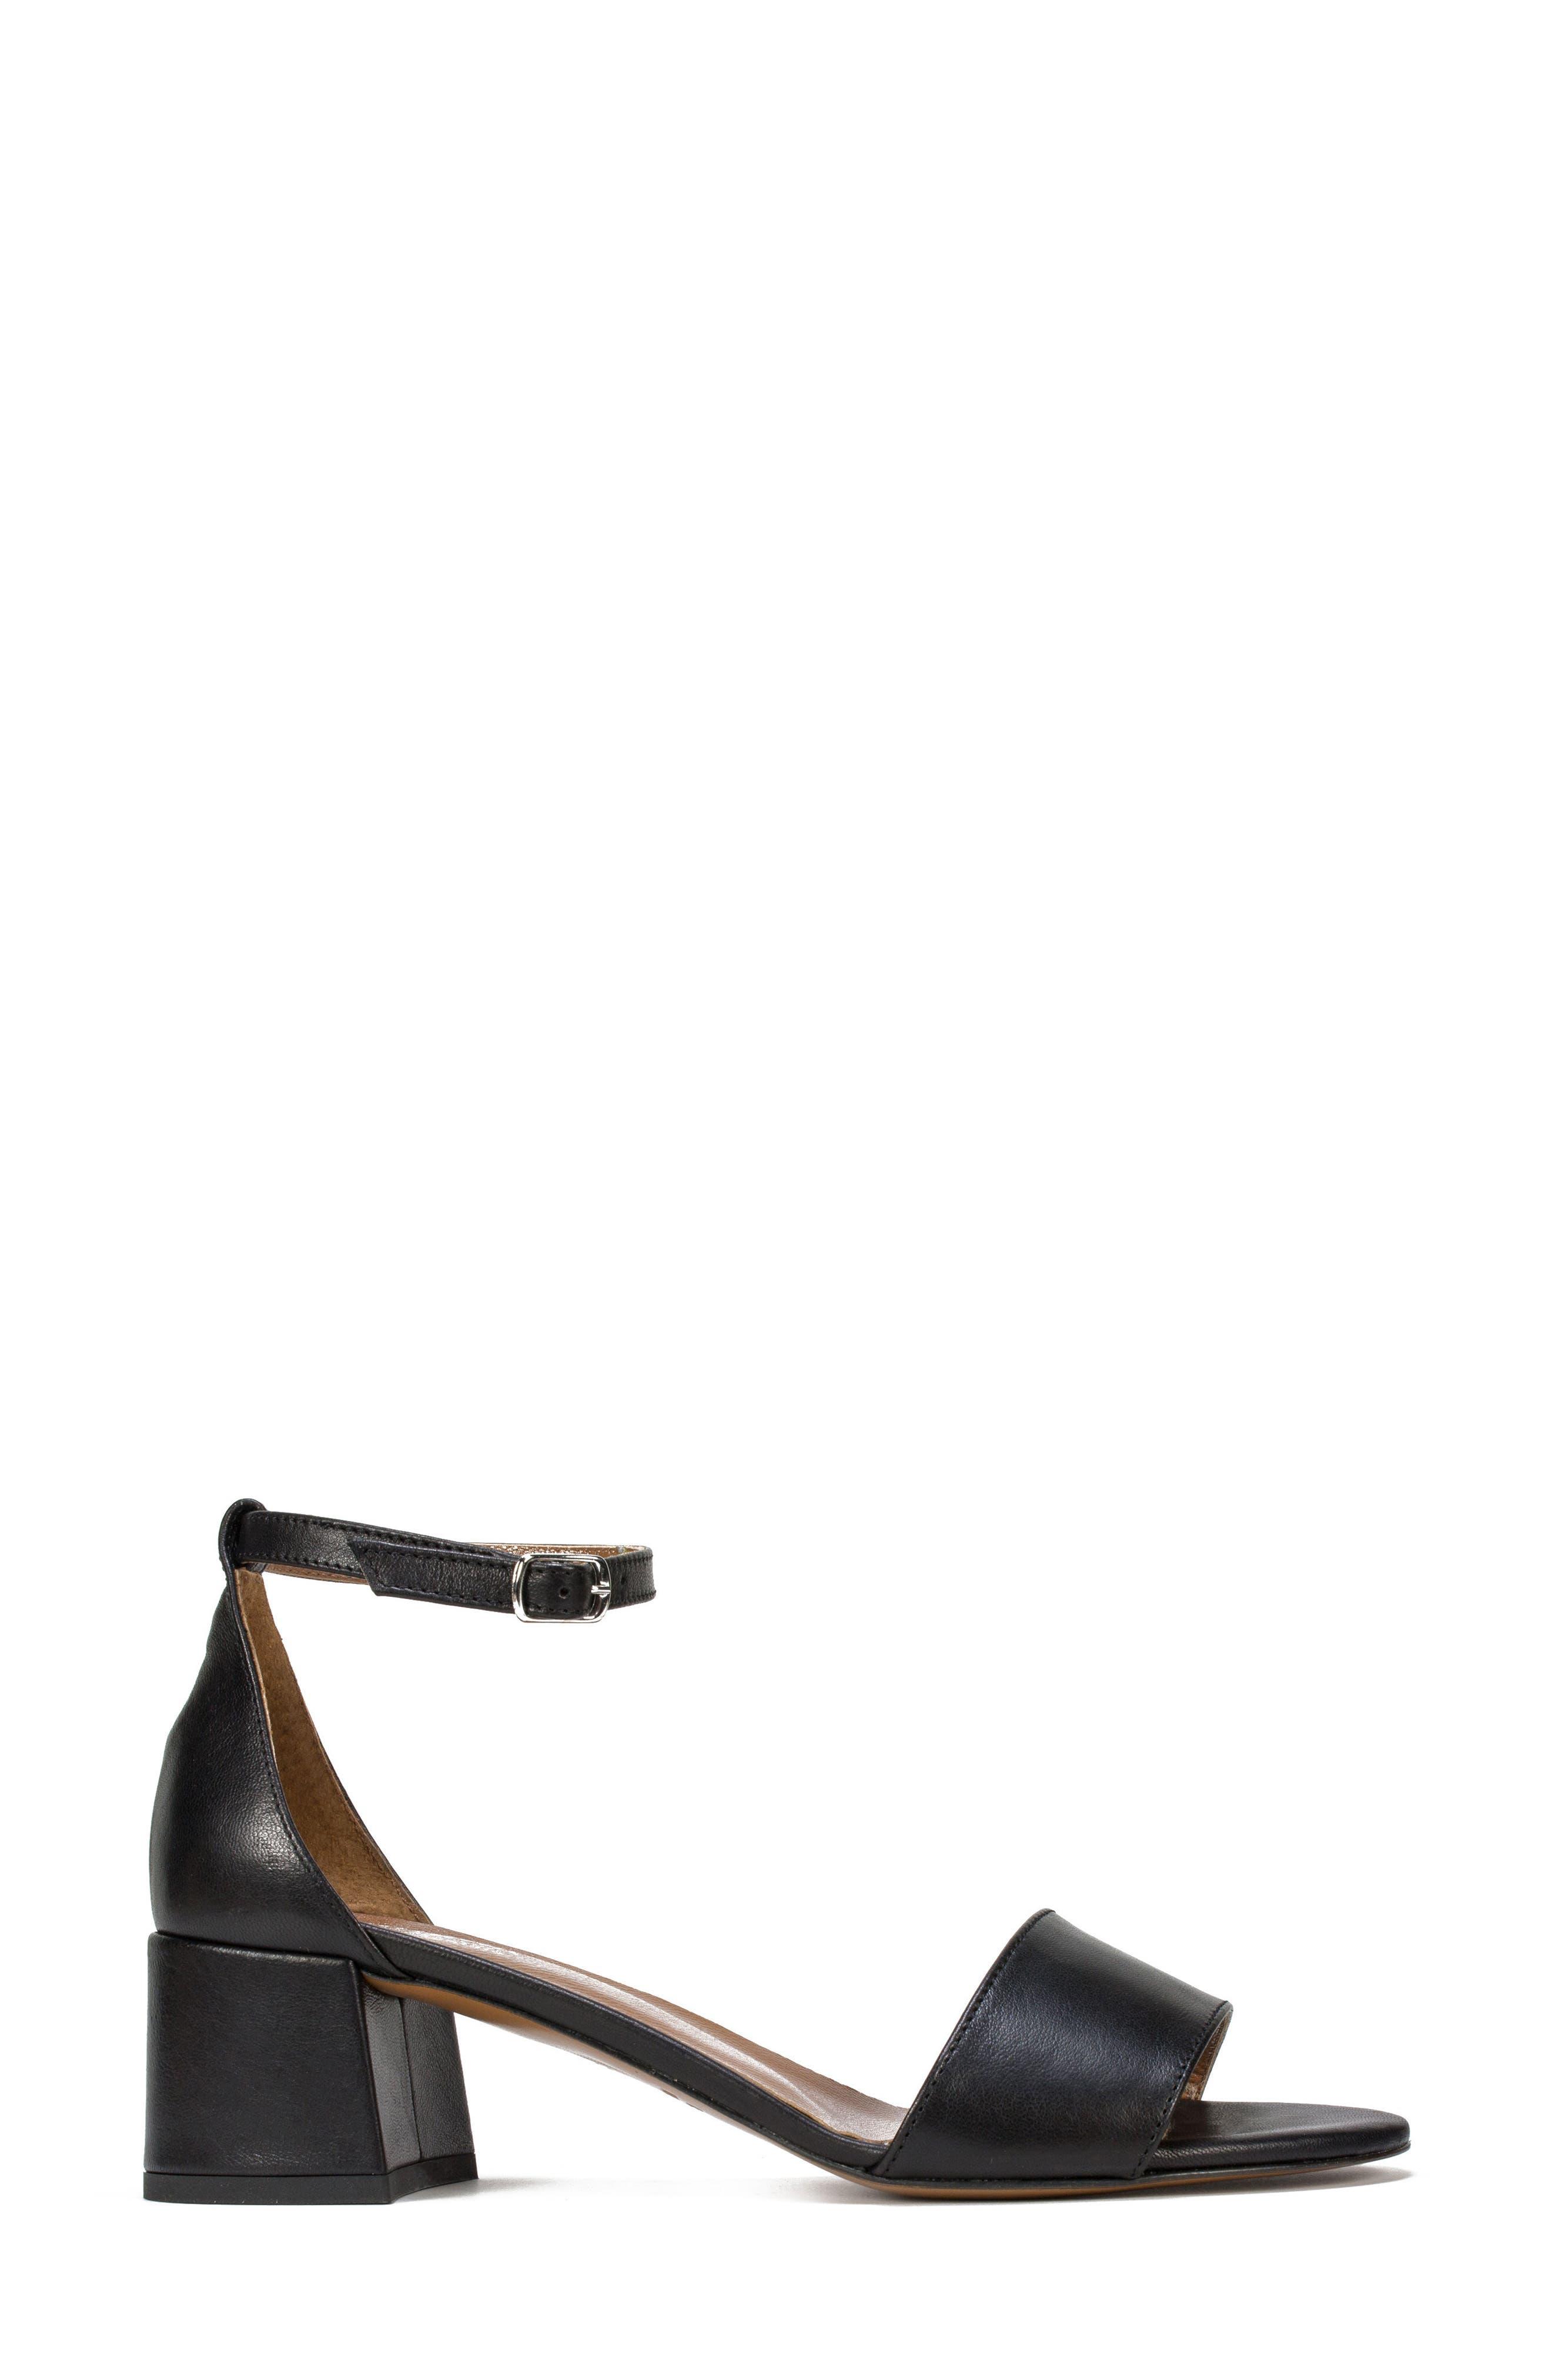 Ameila Block Heel Sandal,                             Alternate thumbnail 3, color,                             Black Leather